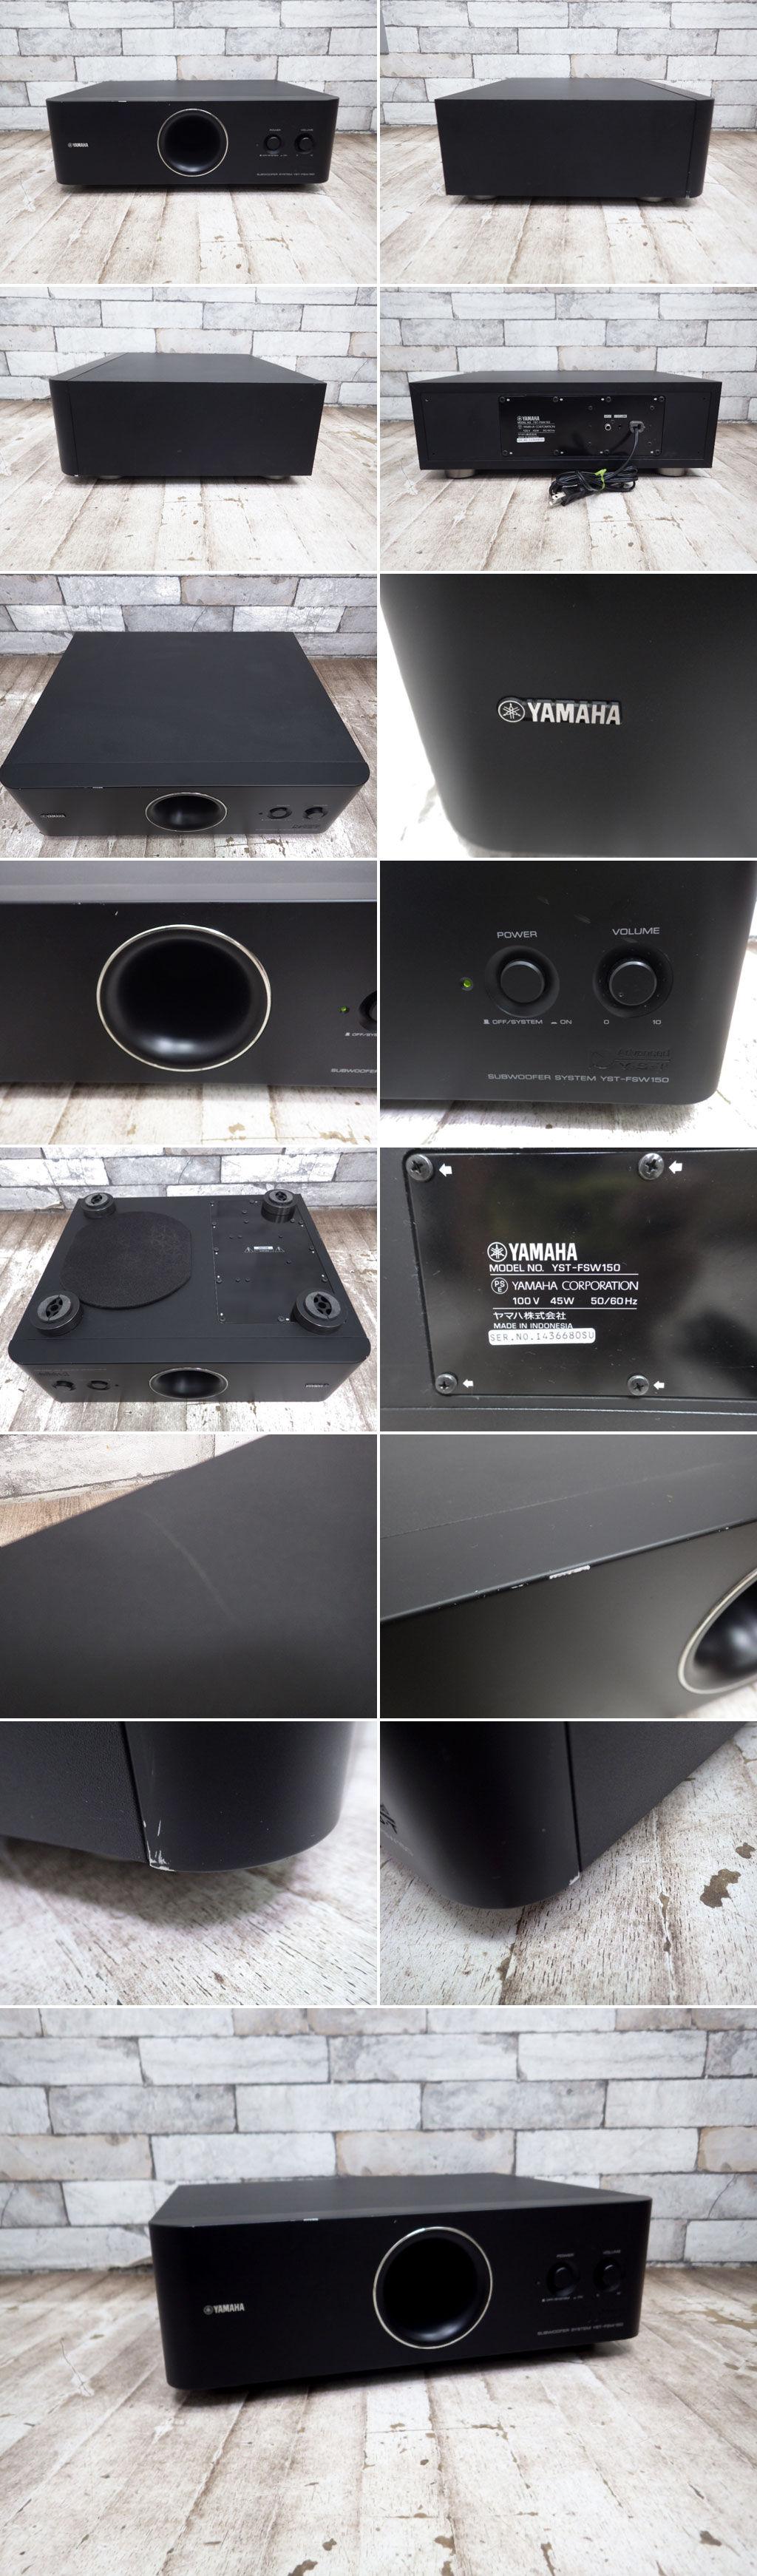 B japan import Black YAMAHA subwoofer system YST-FSW150